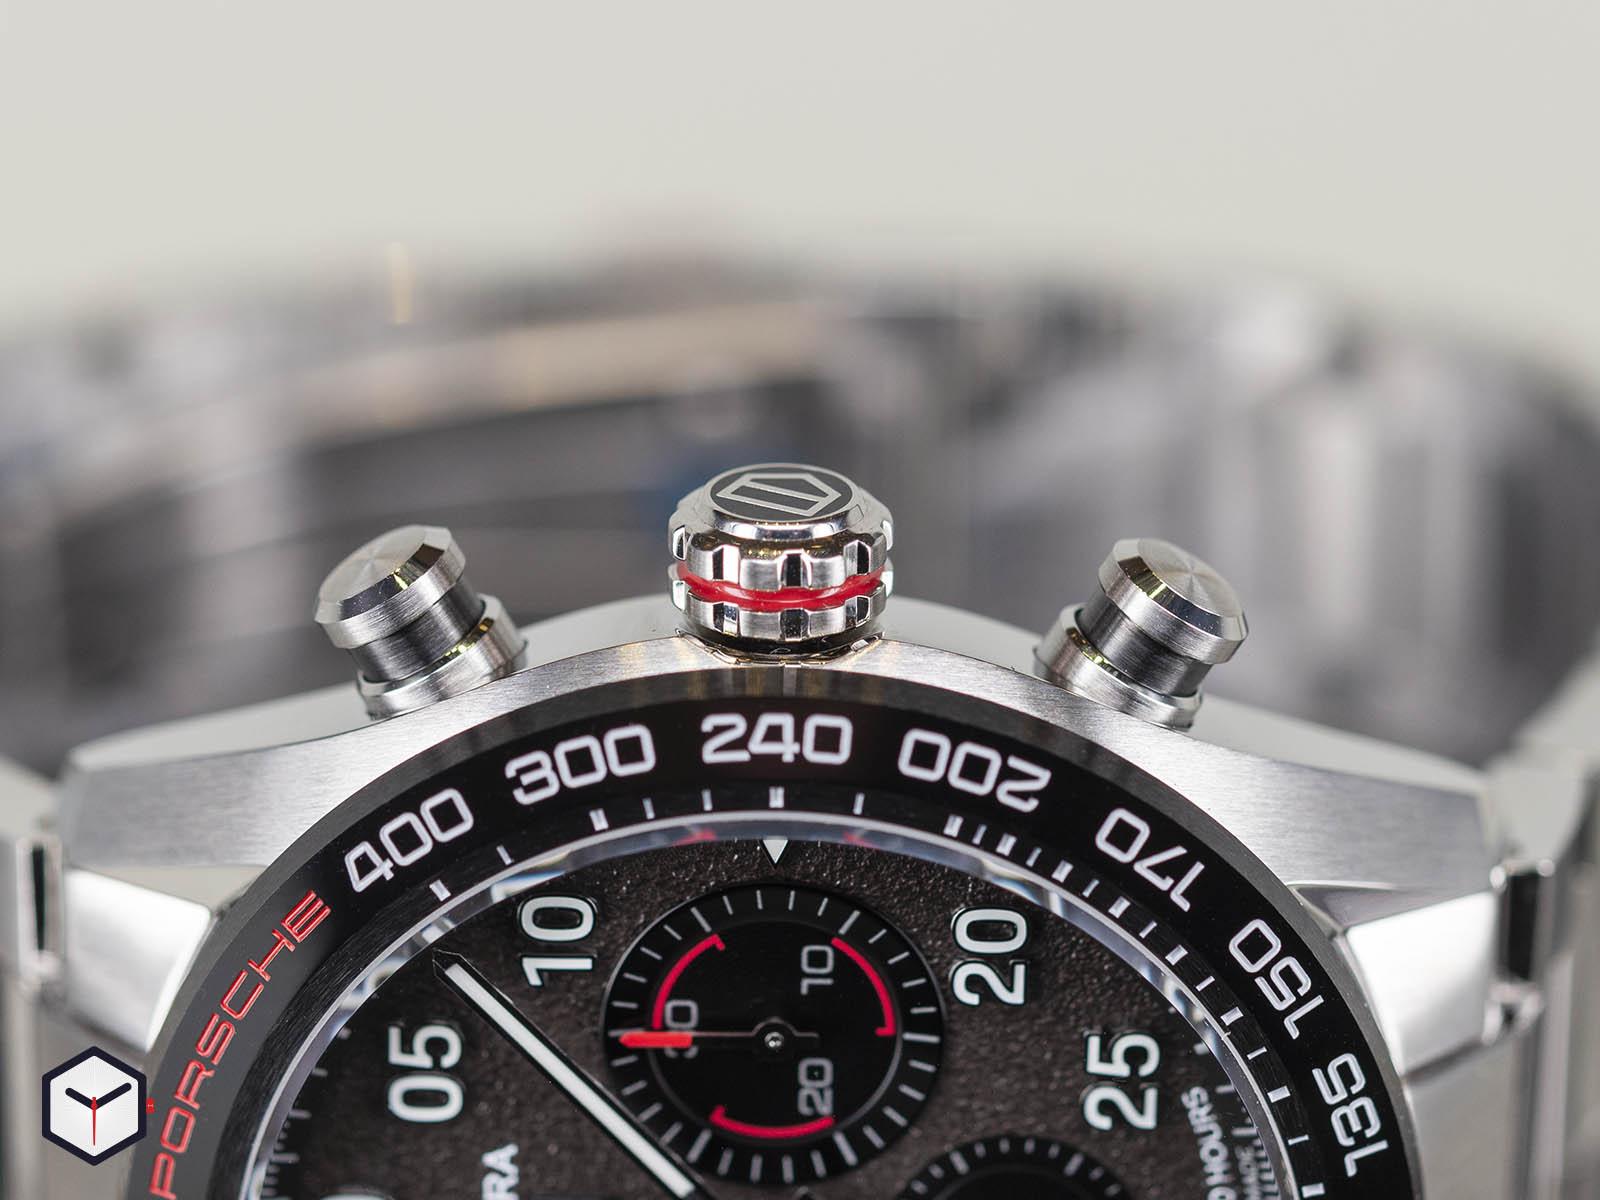 cbn2a1f-ba0643-tag-heuer-carrera-porsche-chronograph-1-5.jpg